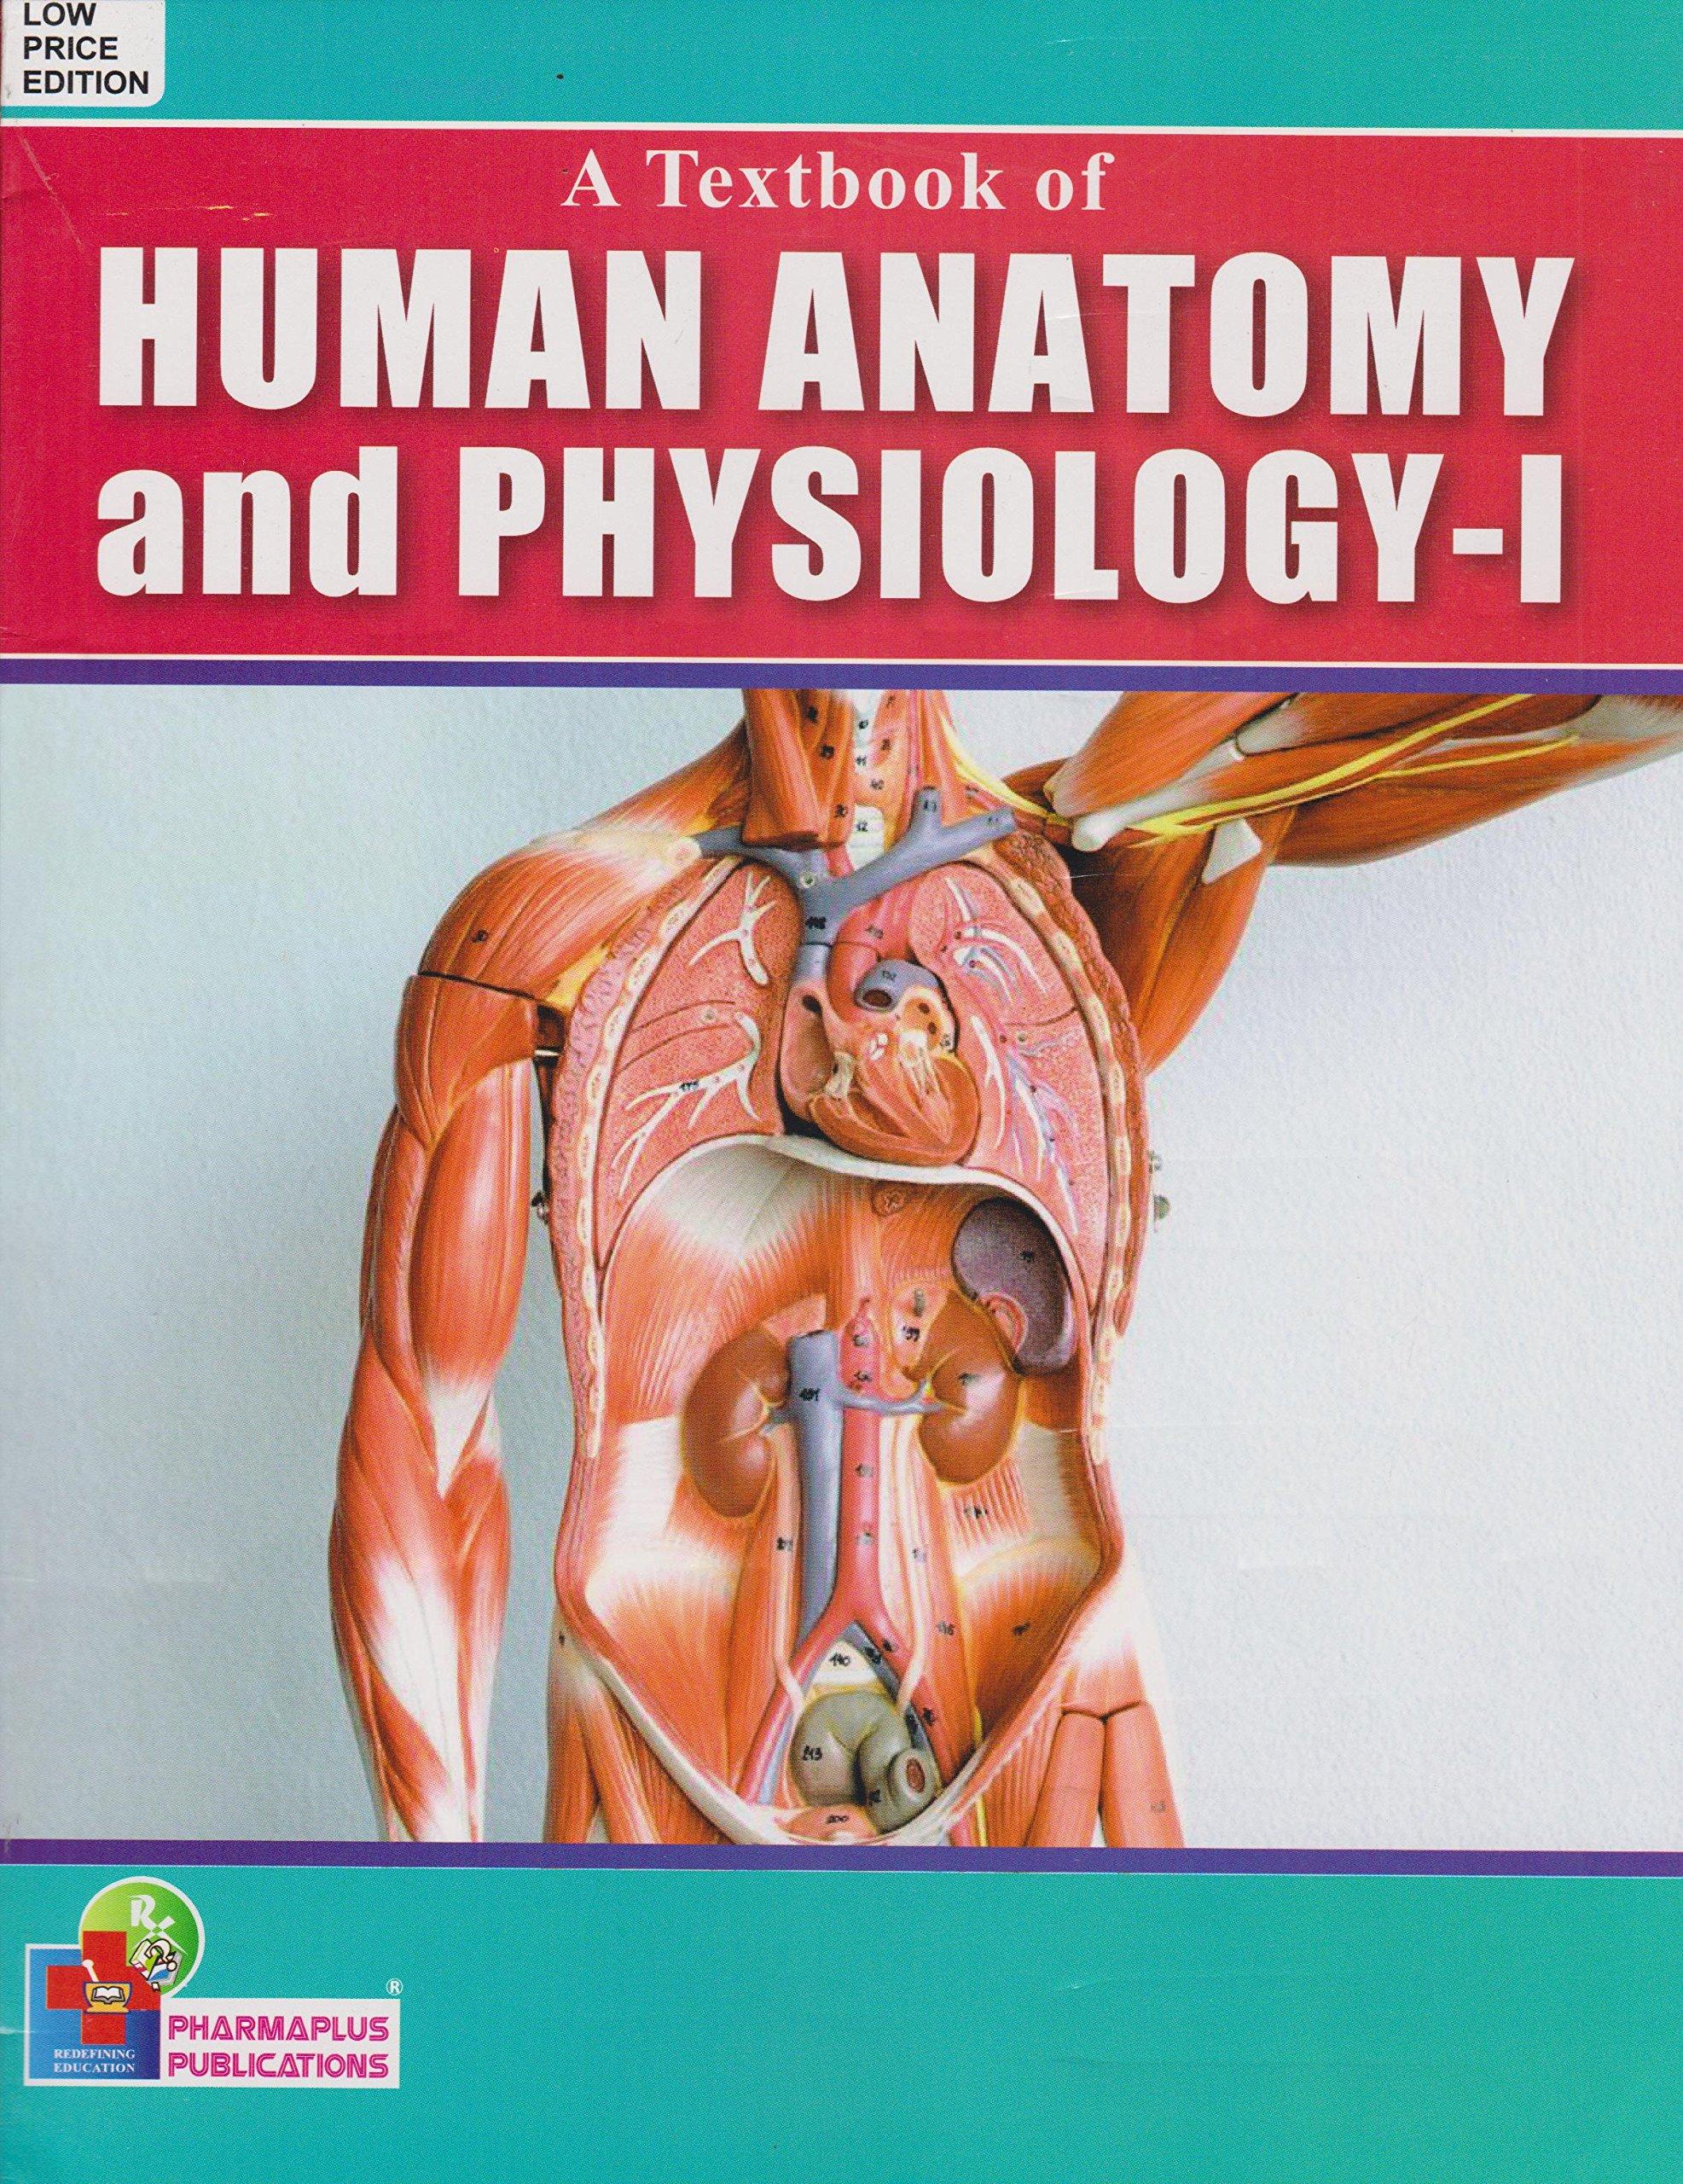 Awesome Human Anatomy Textbook Festooning - Anatomy and Physiology ...